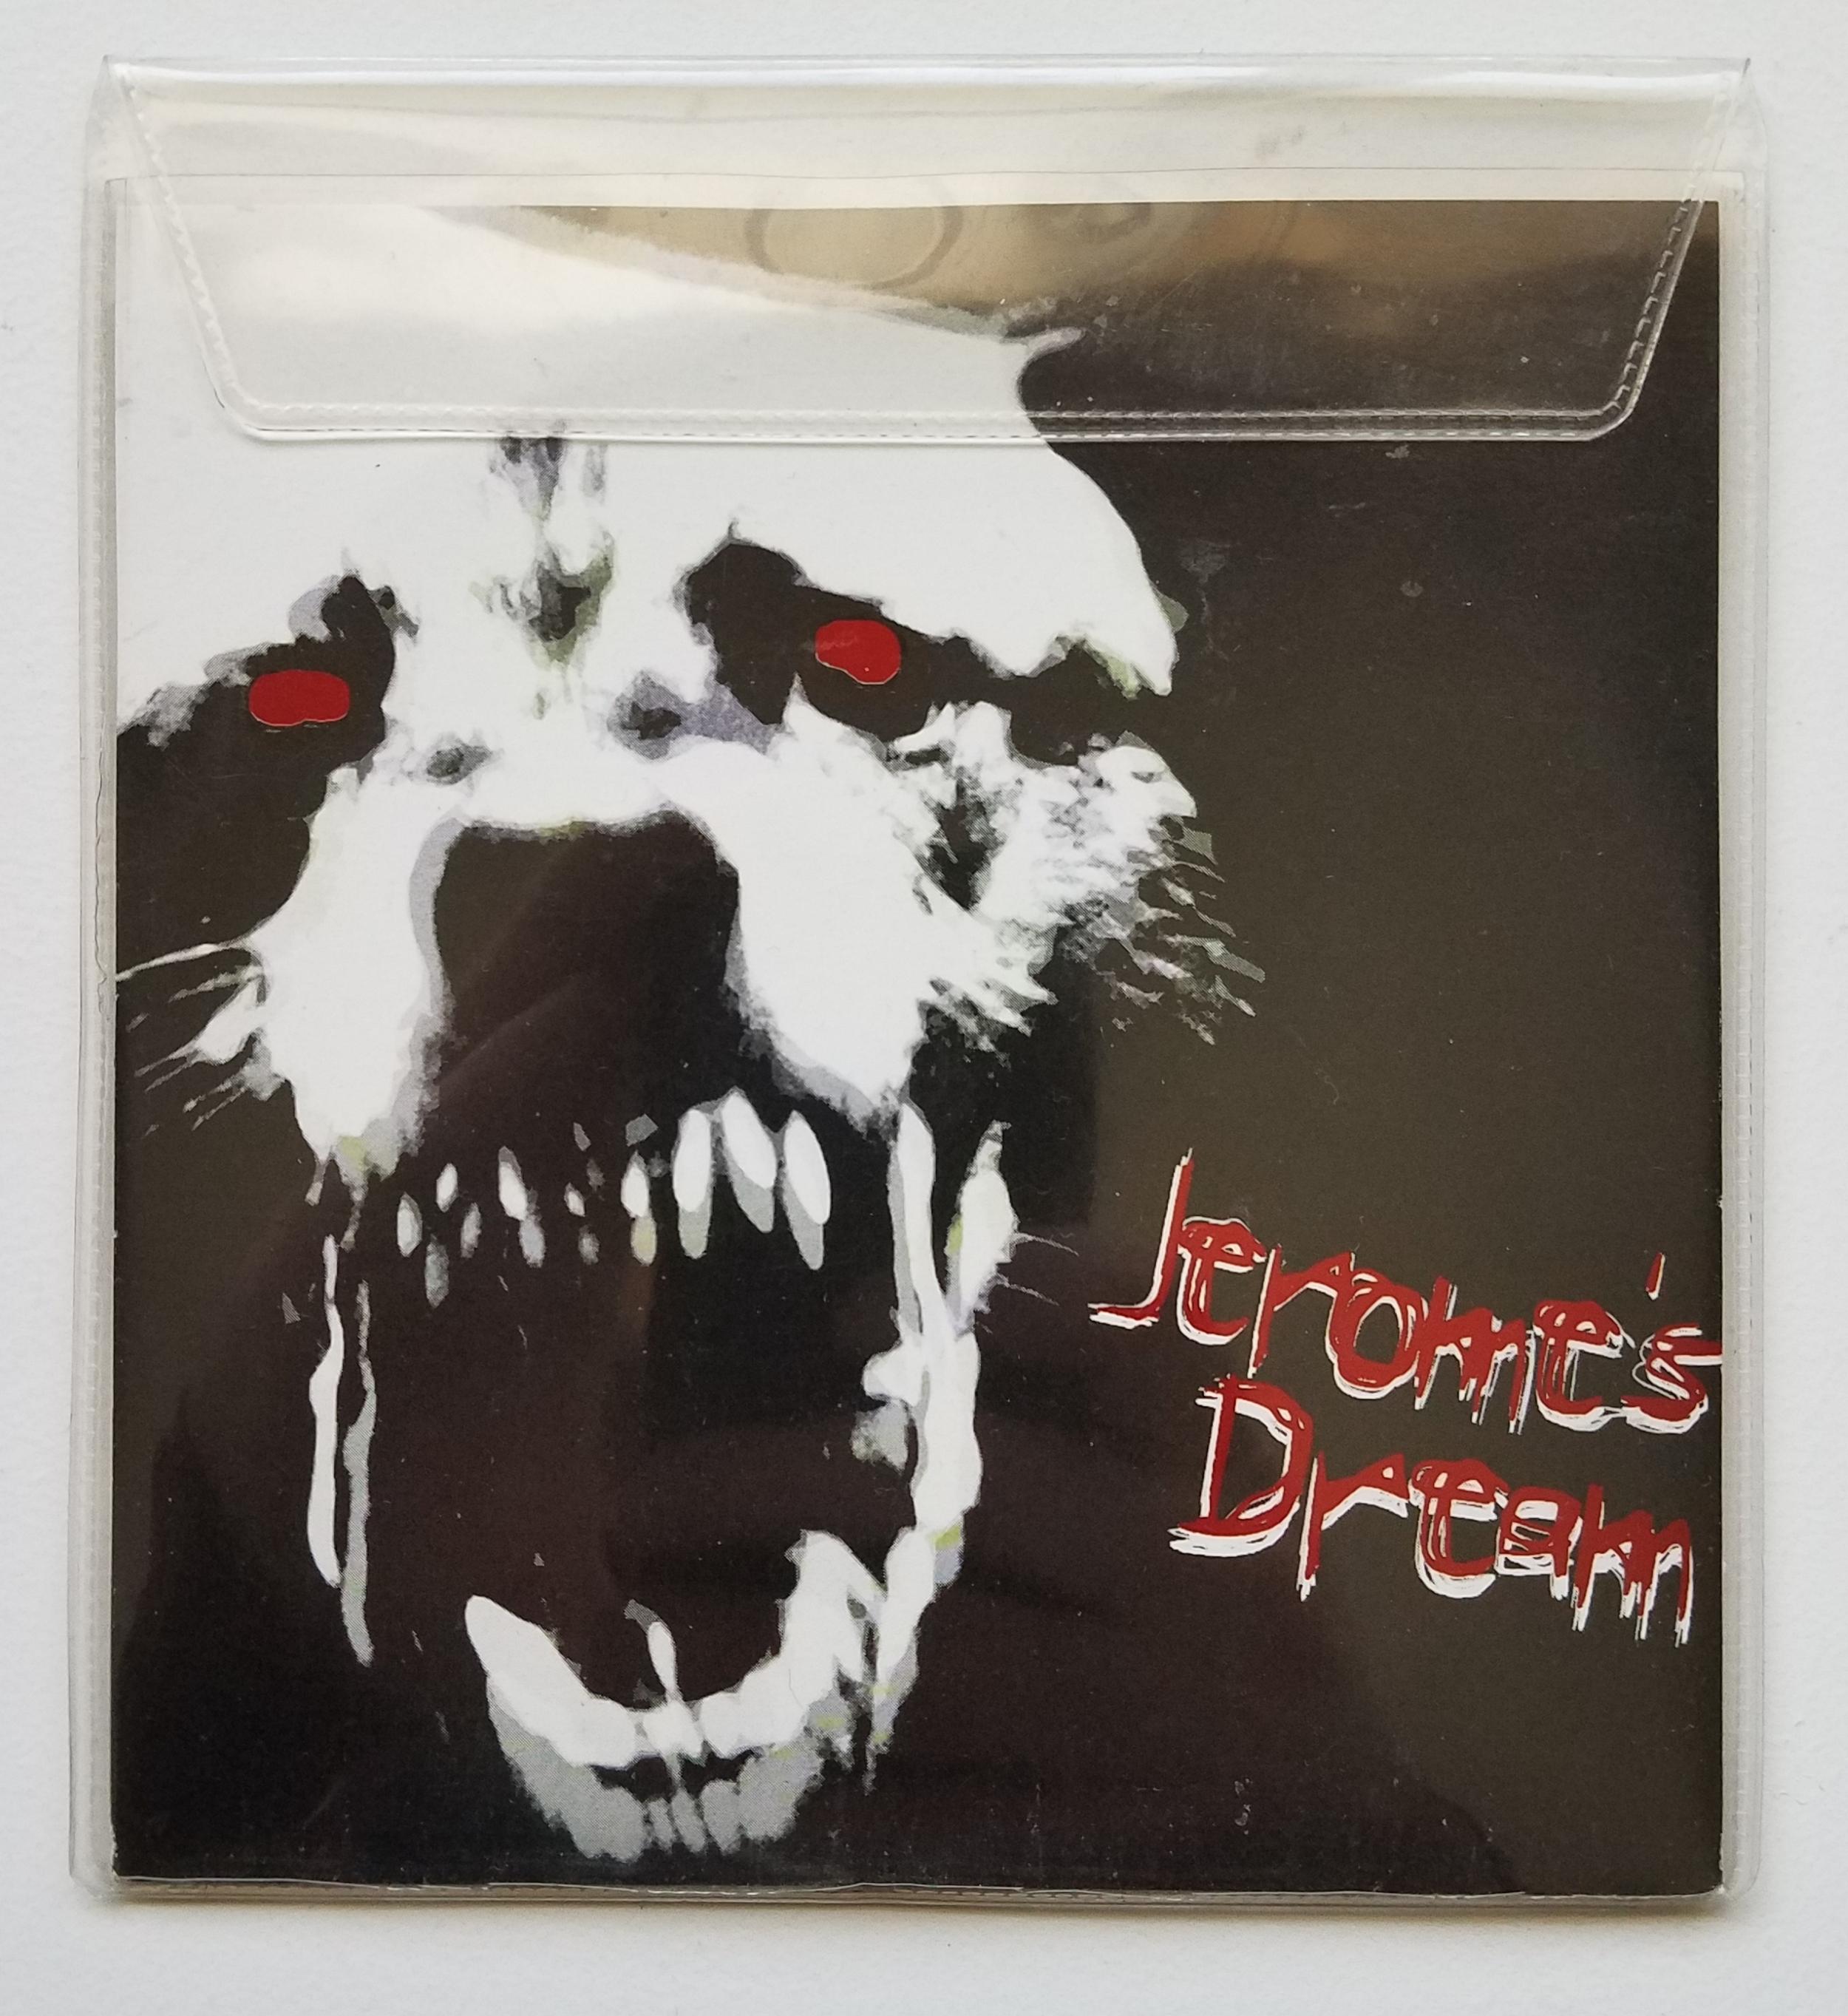 Jerome's Dream / The Book Of Dead Names - Split 5